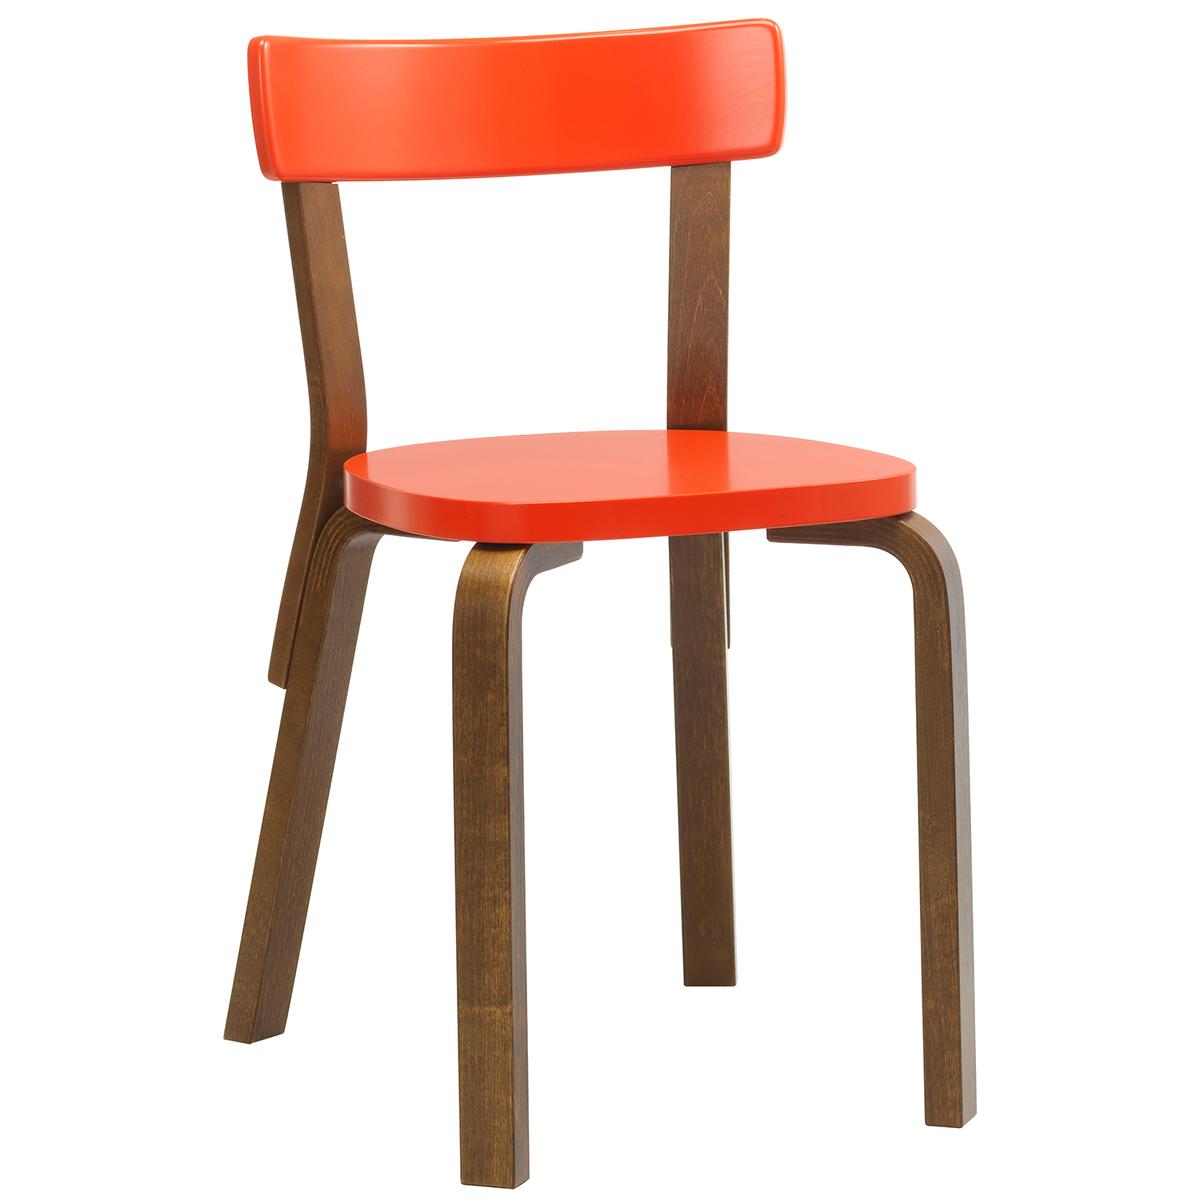 Artek aalto chair 69 bright red walnut finnish design shop